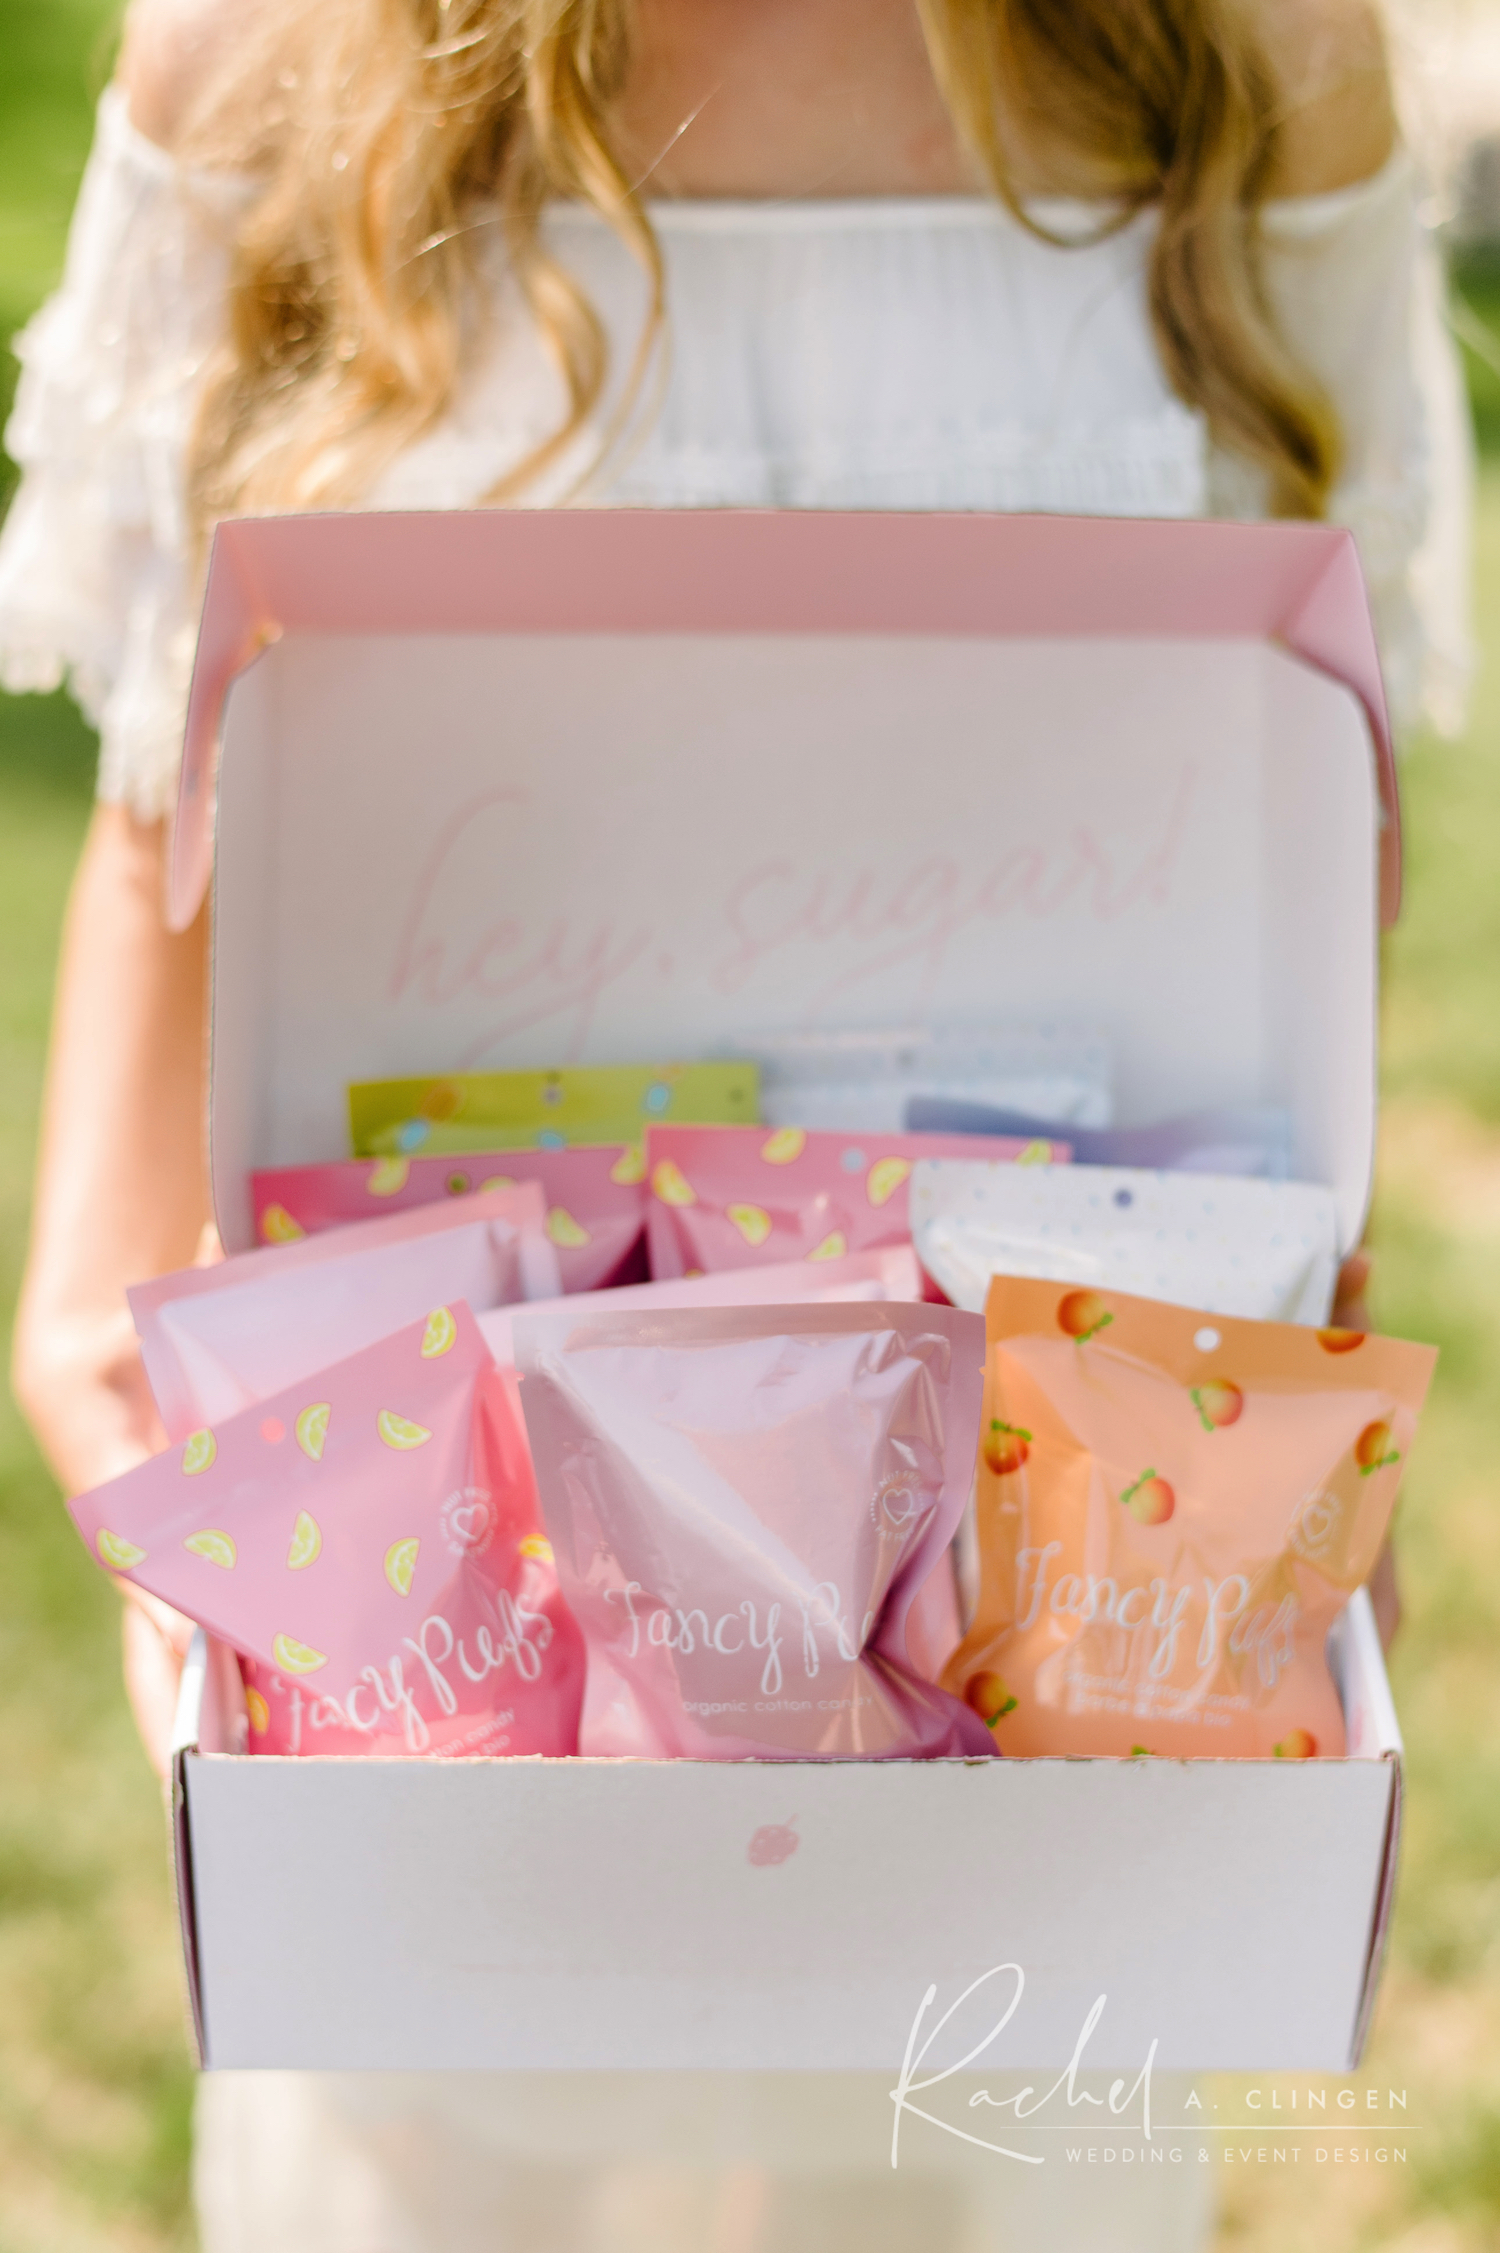 fancypuffs cotton candy